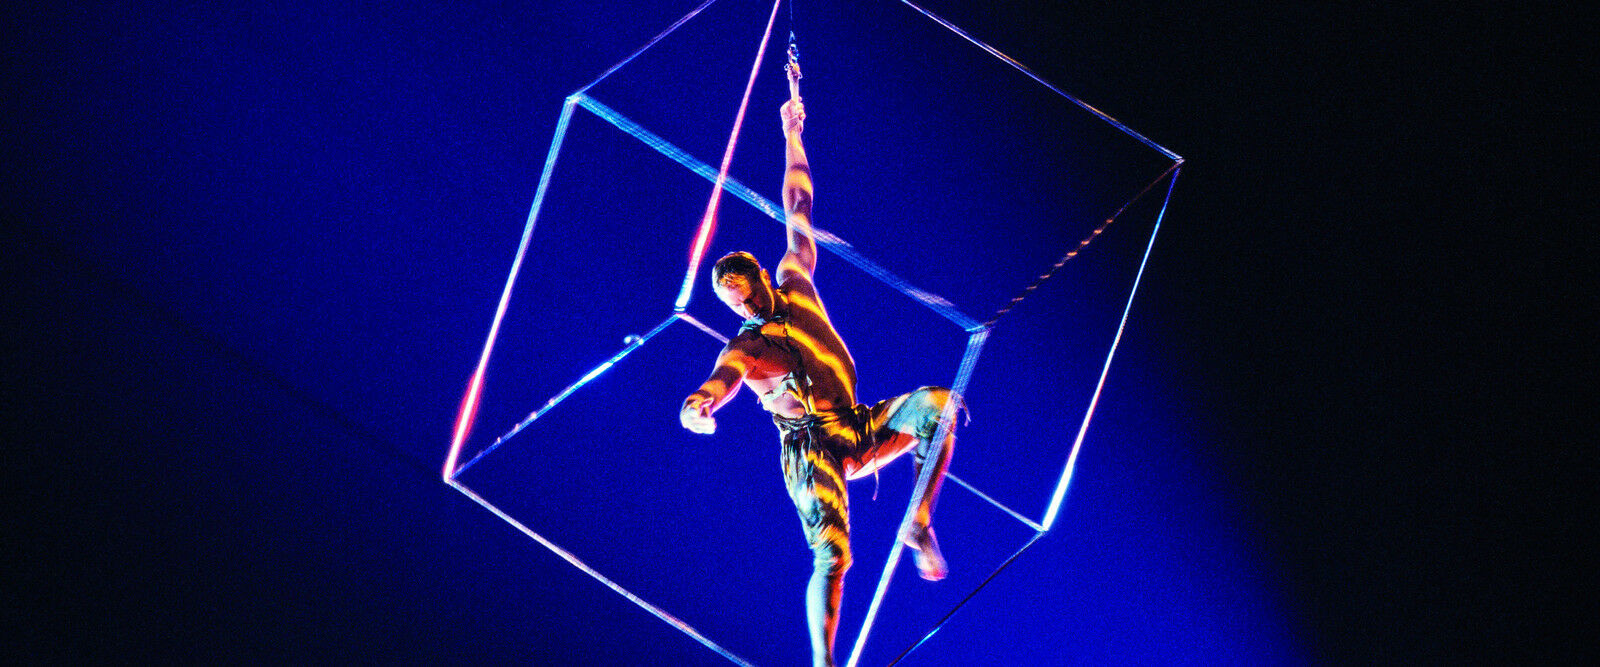 Cirque du Soleil Mystere Las Vegas | Las Vegas, NV | Treasure Island - Mystere Theater | December 10, 2017